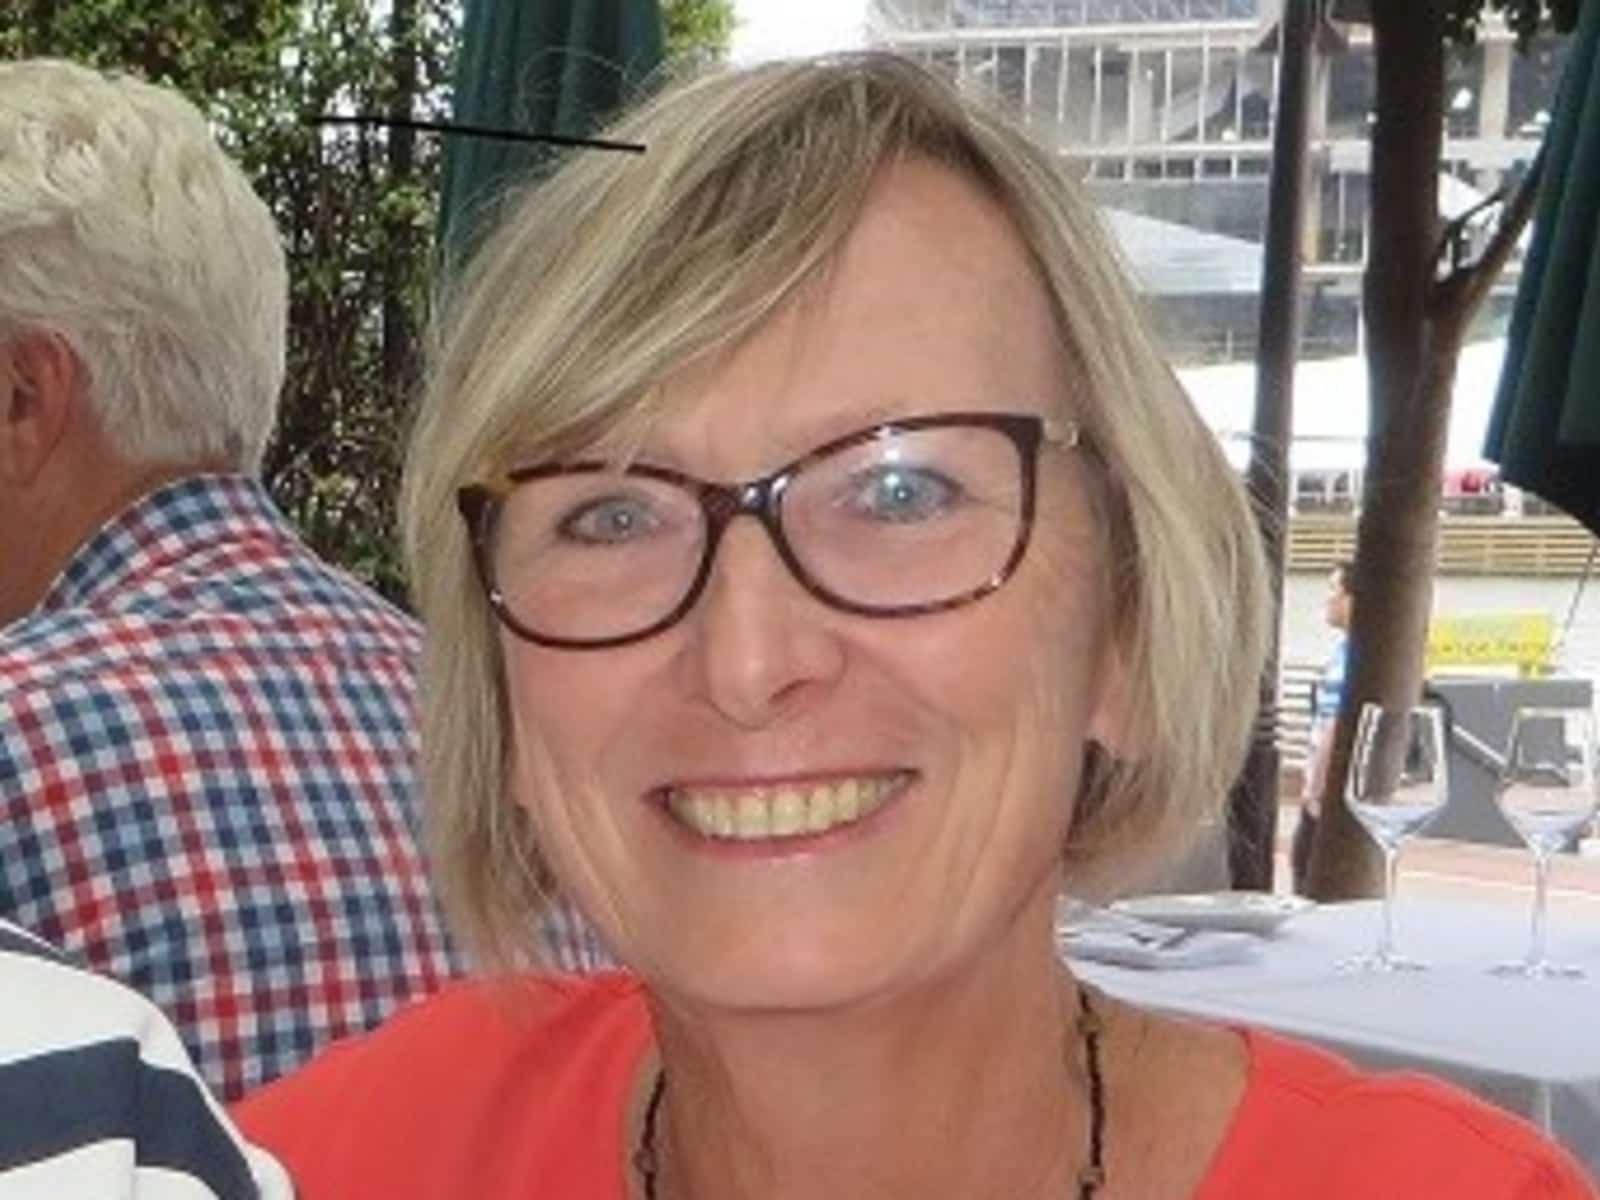 Janet from Adelaide, South Australia, Australia